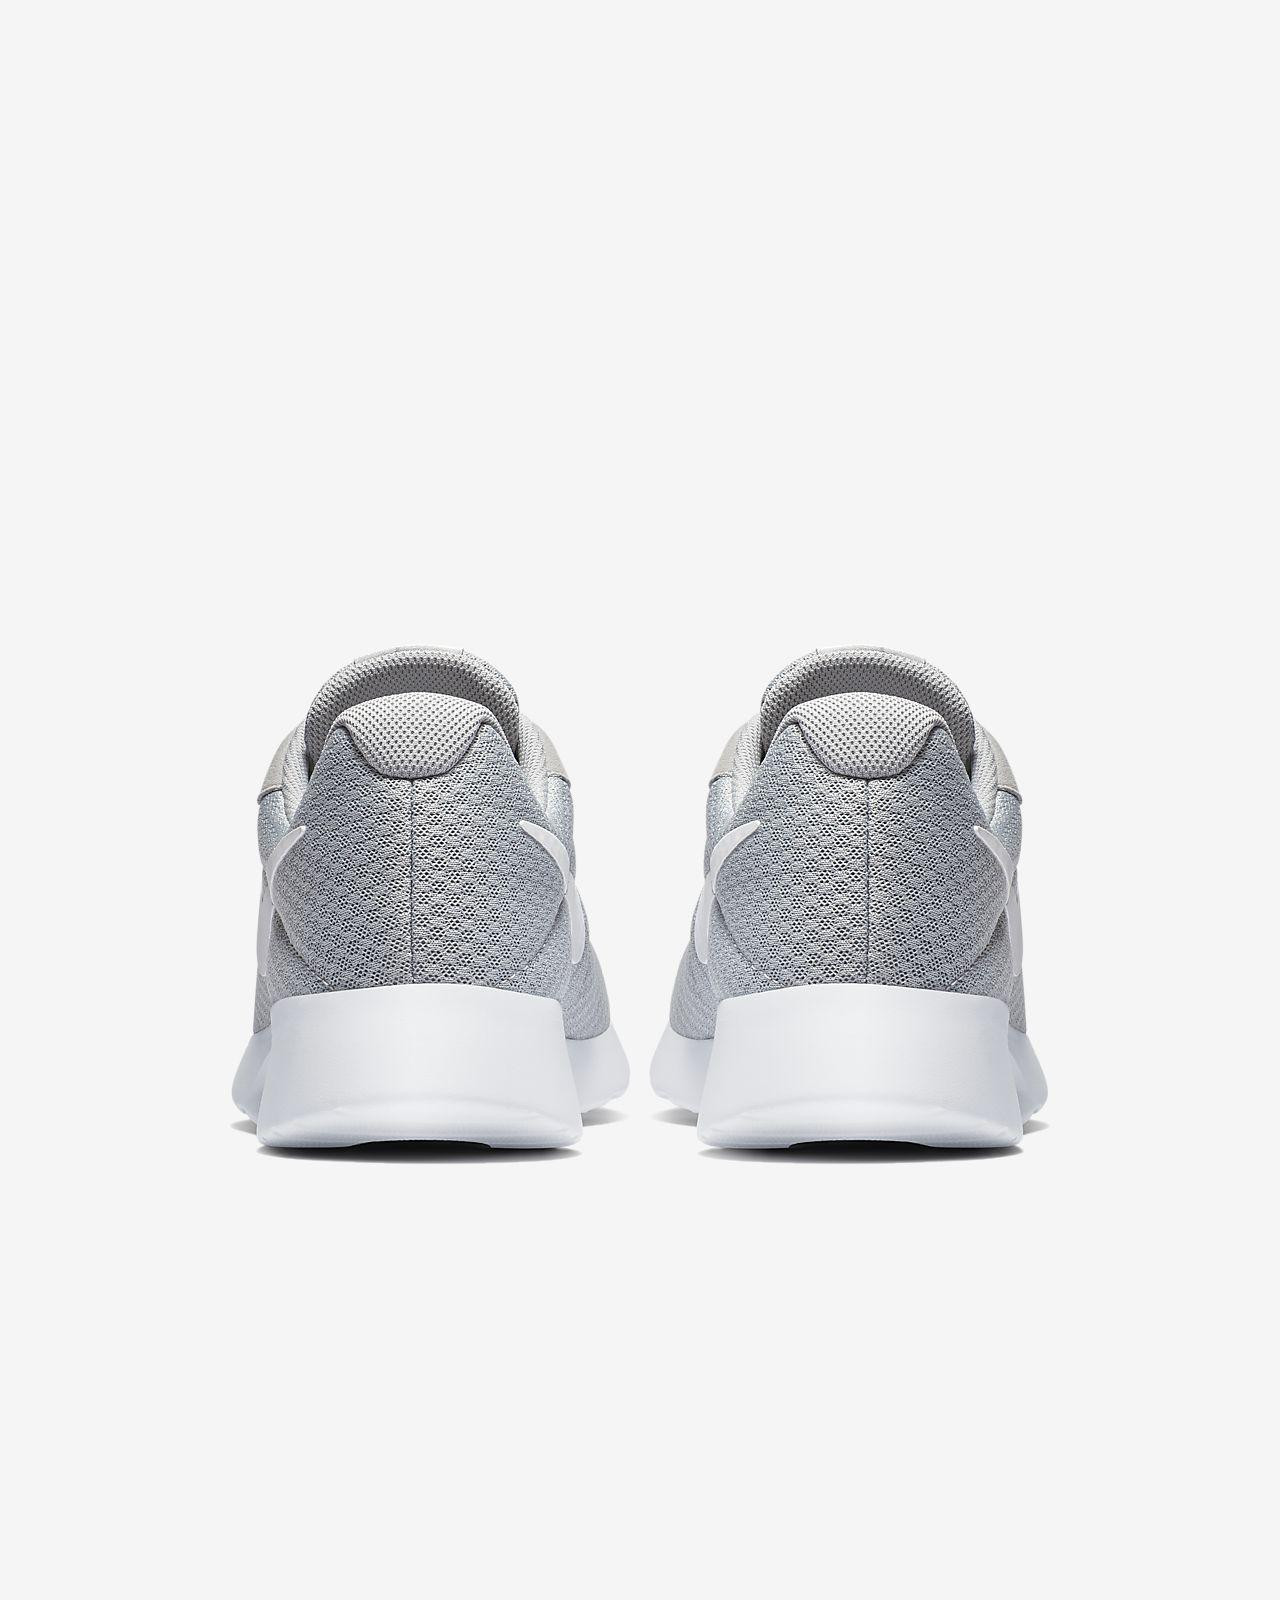 Tanjun Nike Scarpa Tanjun UomoCh Nike Scarpa Nwmnv80